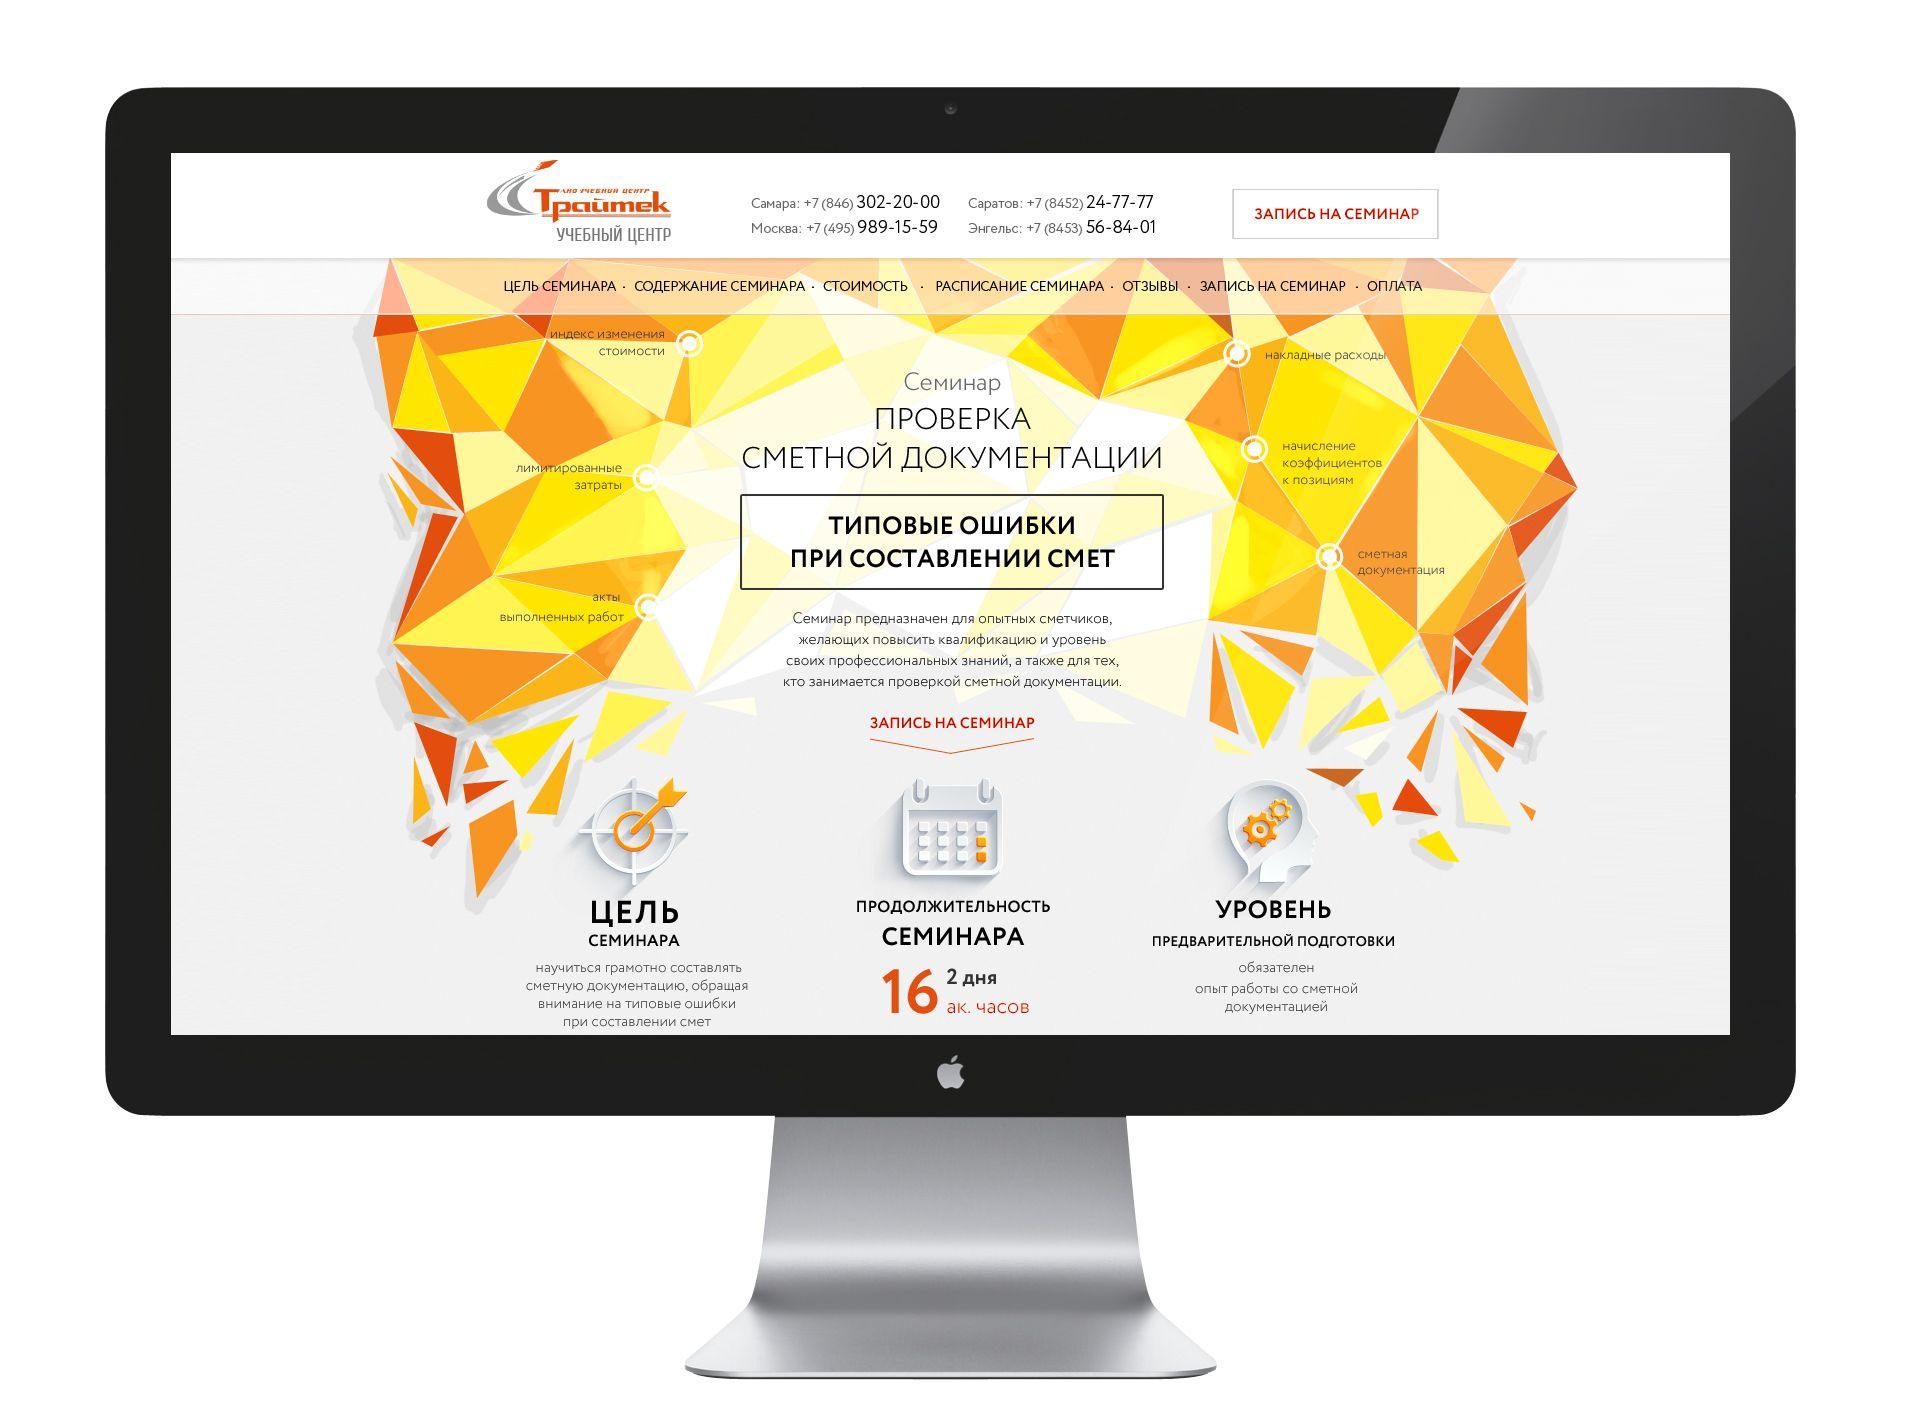 Лендинг для записи на вебинар по сметному делу  - дизайнер IrinaKaoma